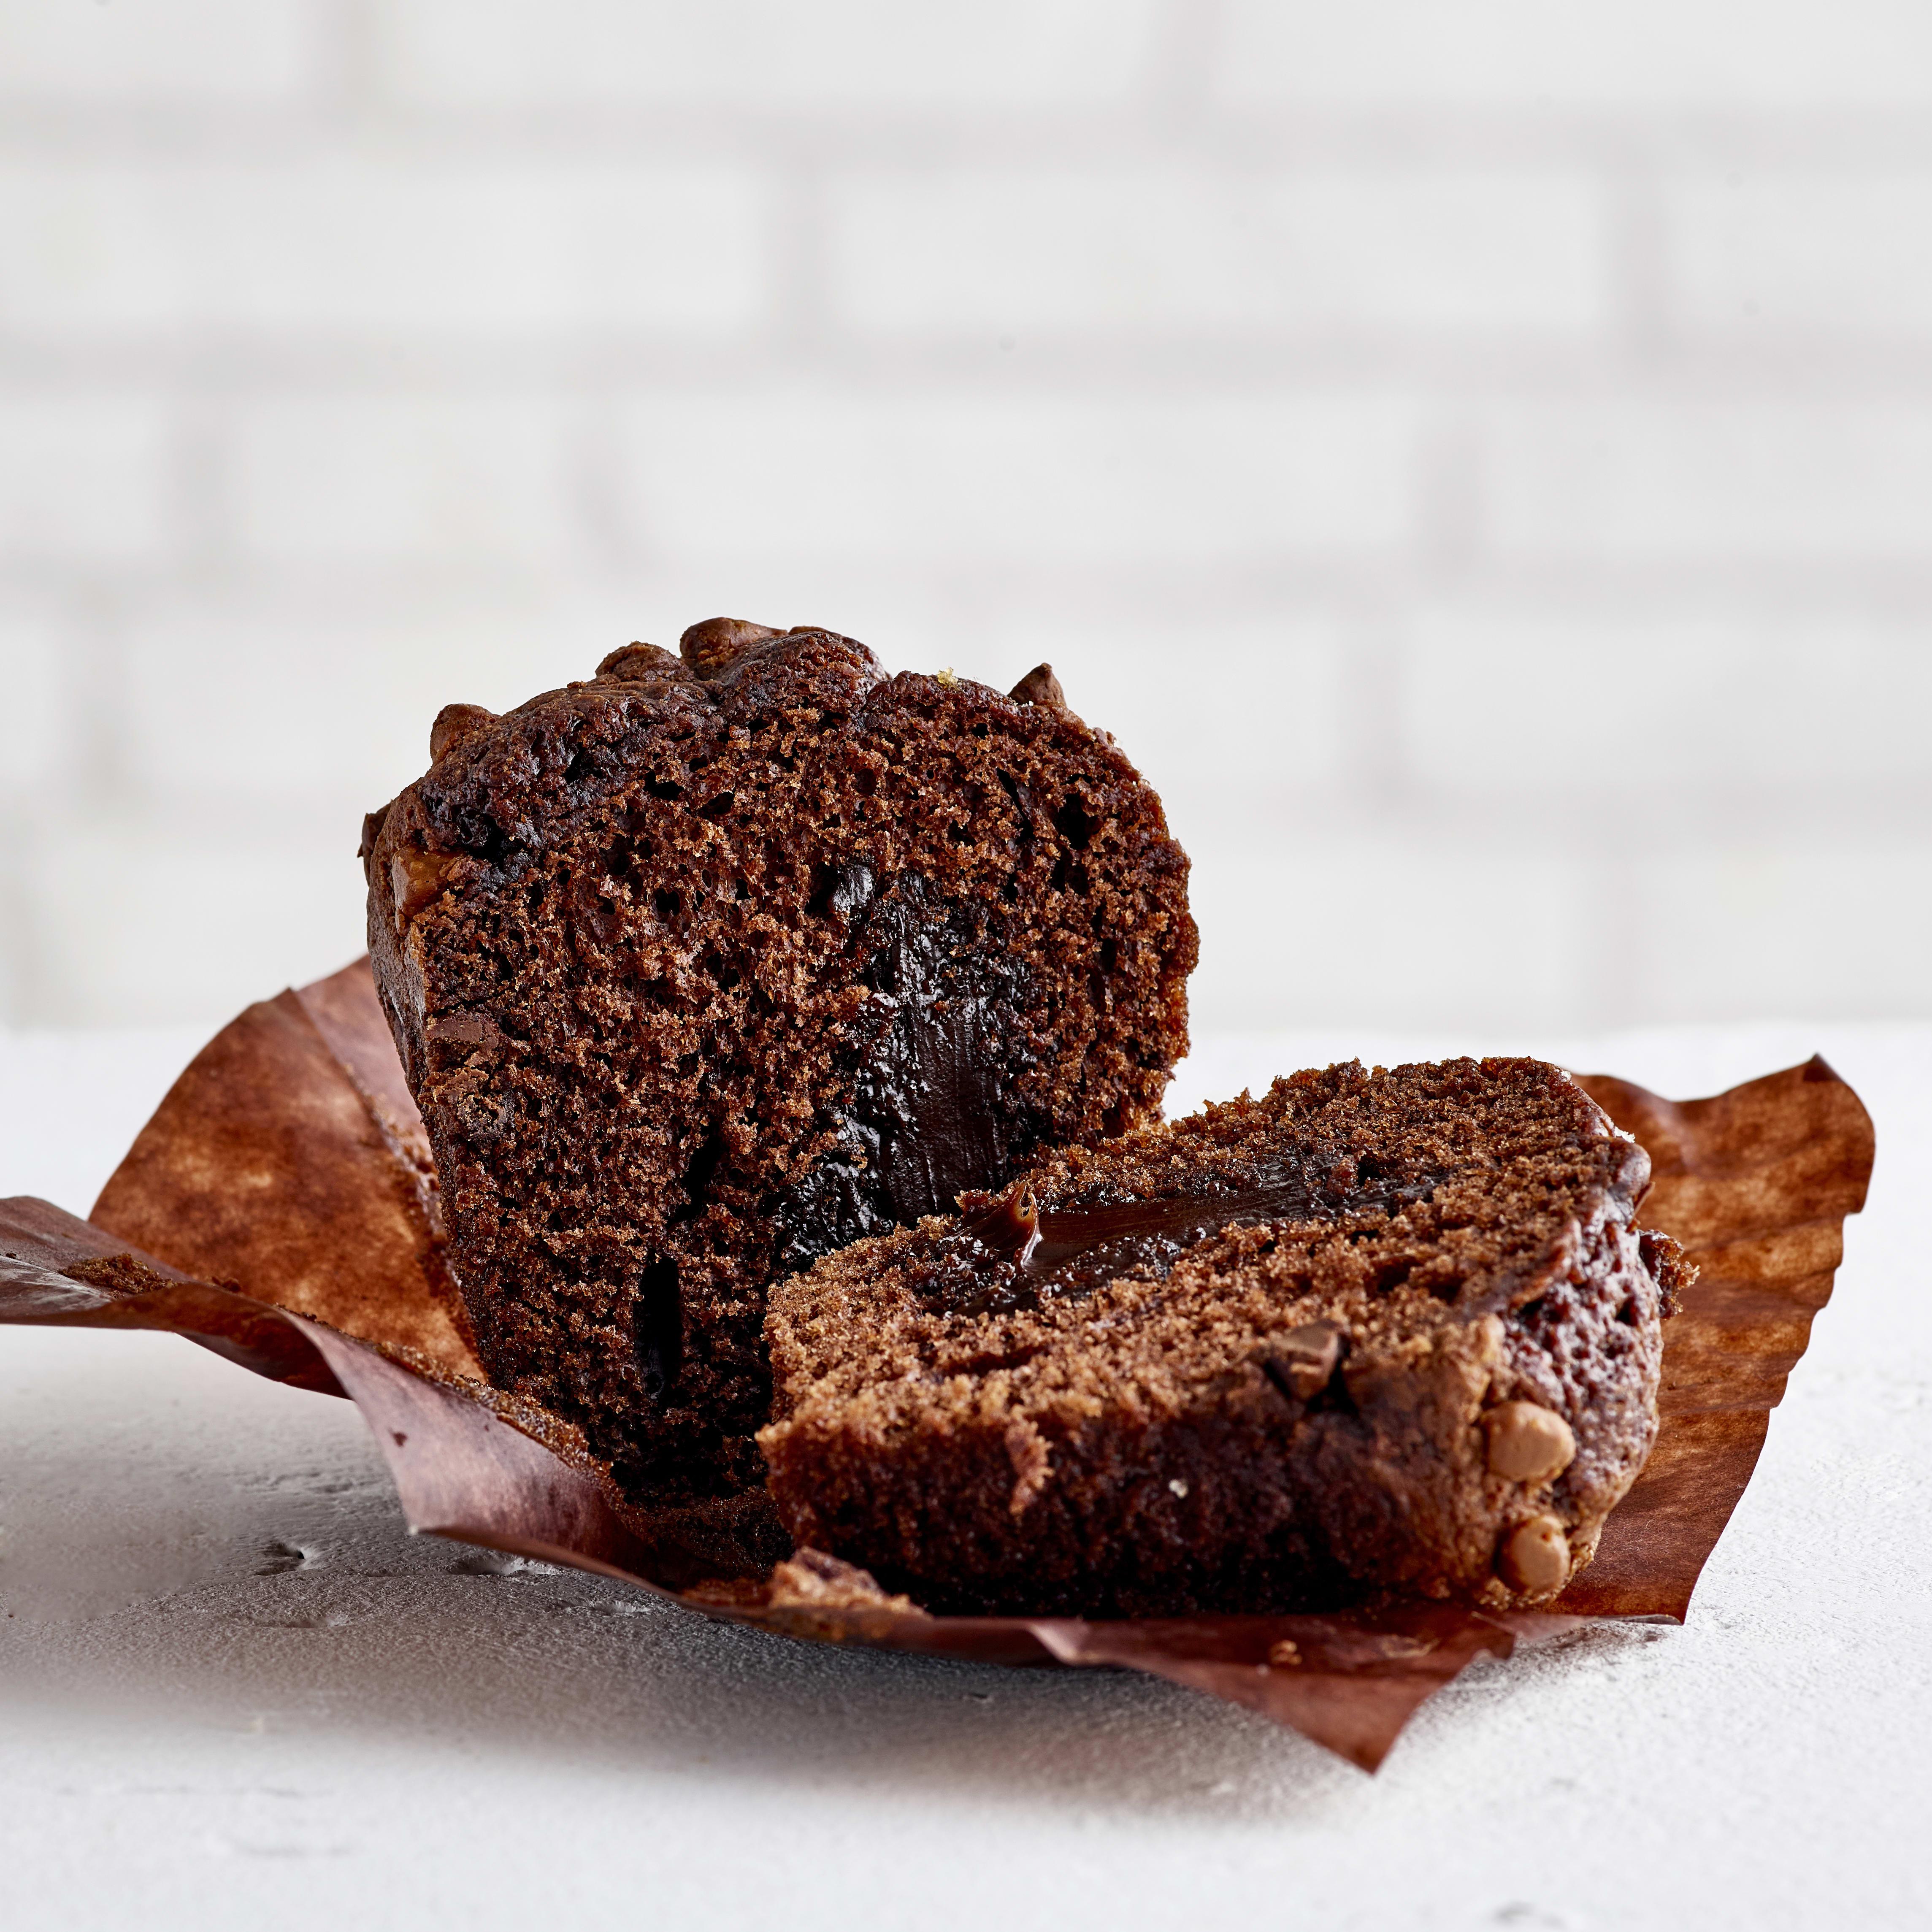 Flower & White Triple Chocolate Muffin, 110g